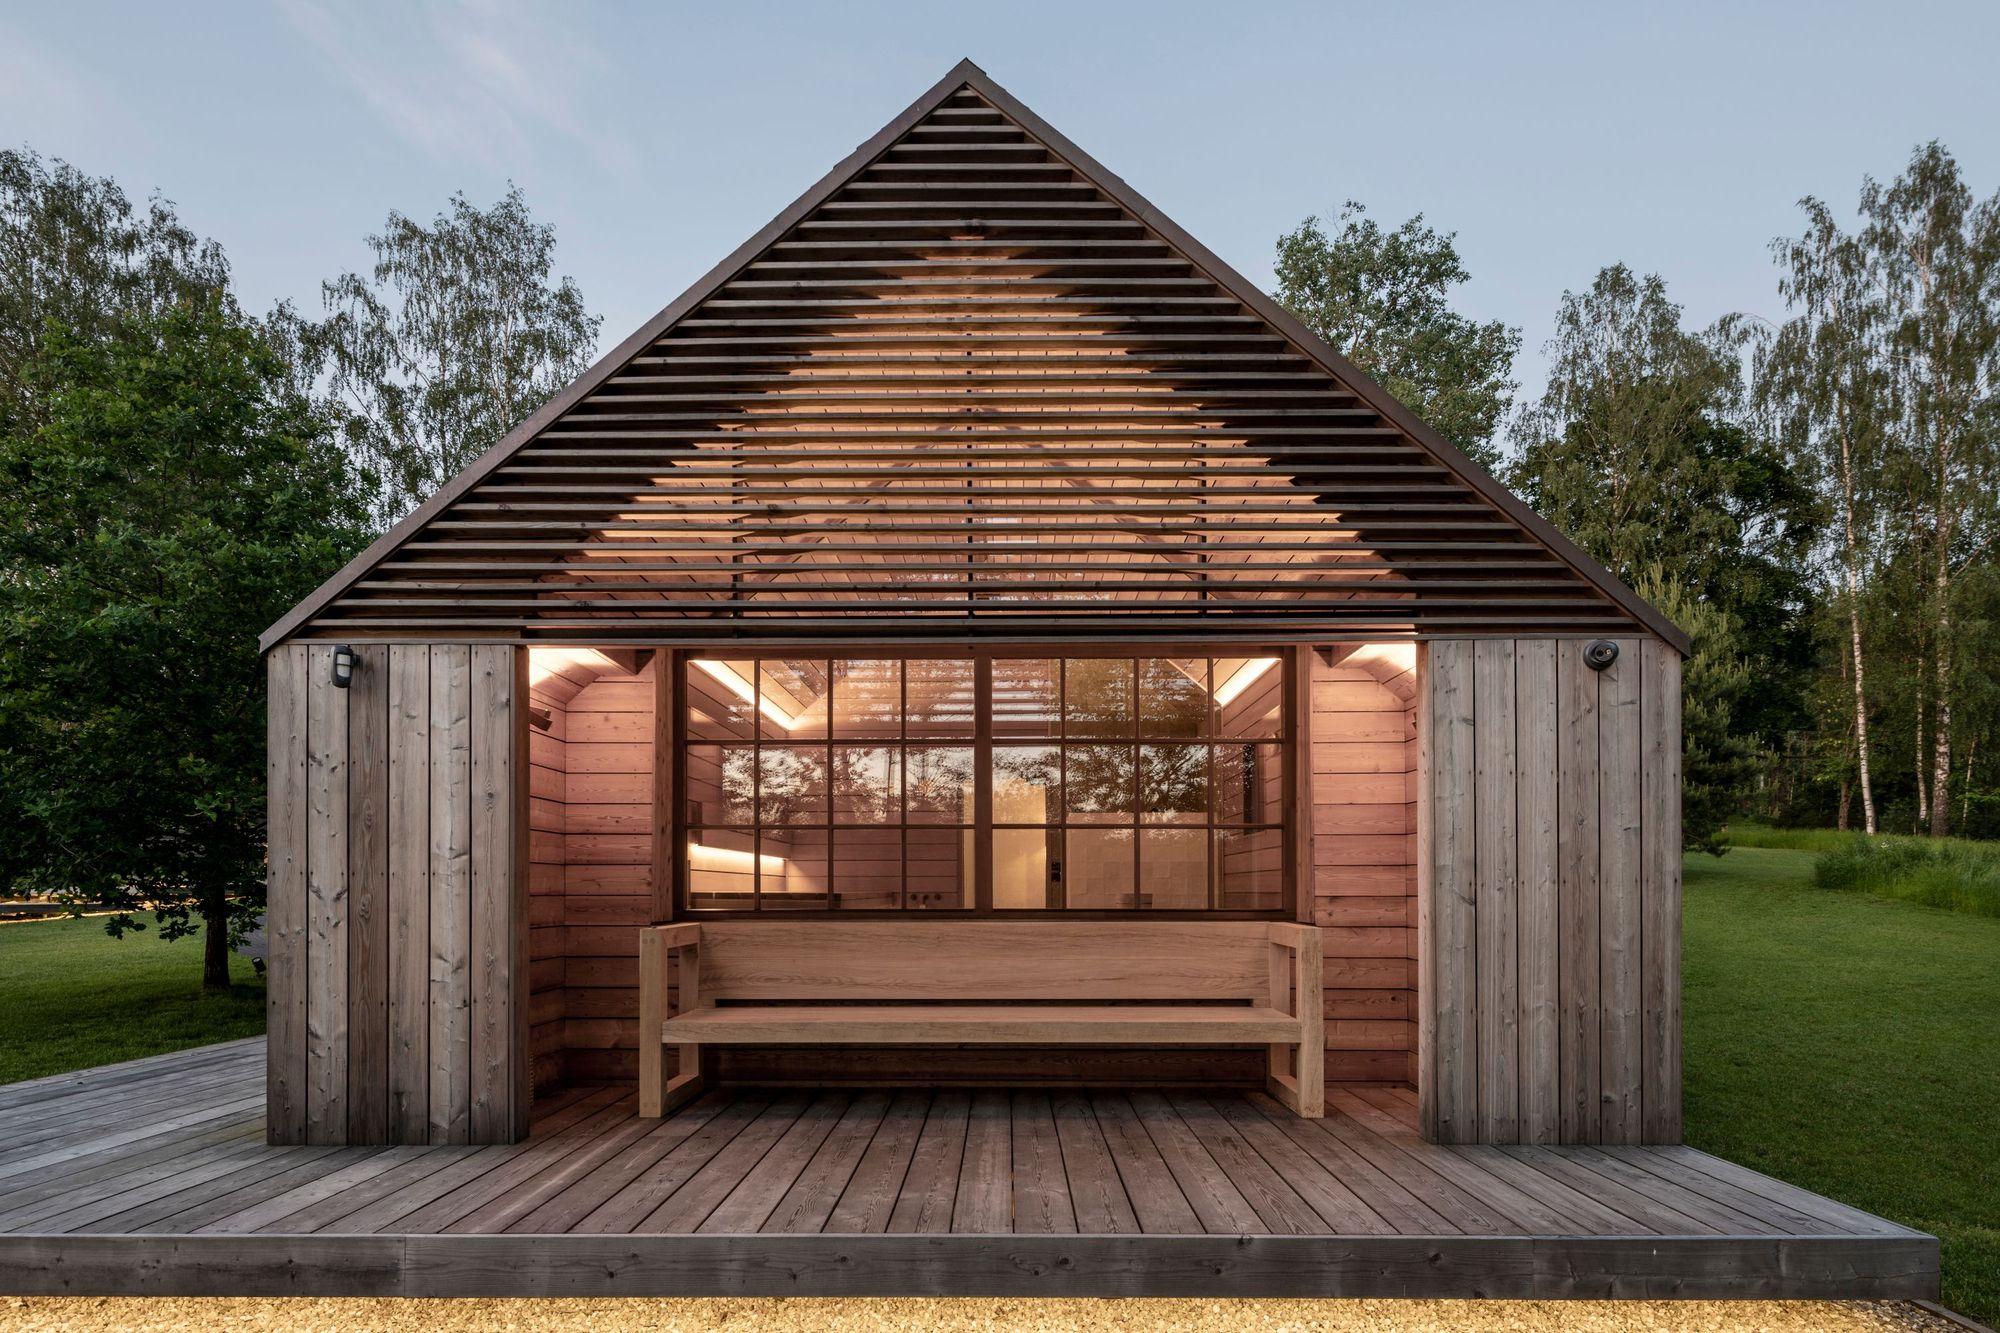 Avatar Home / Devyni Architektai